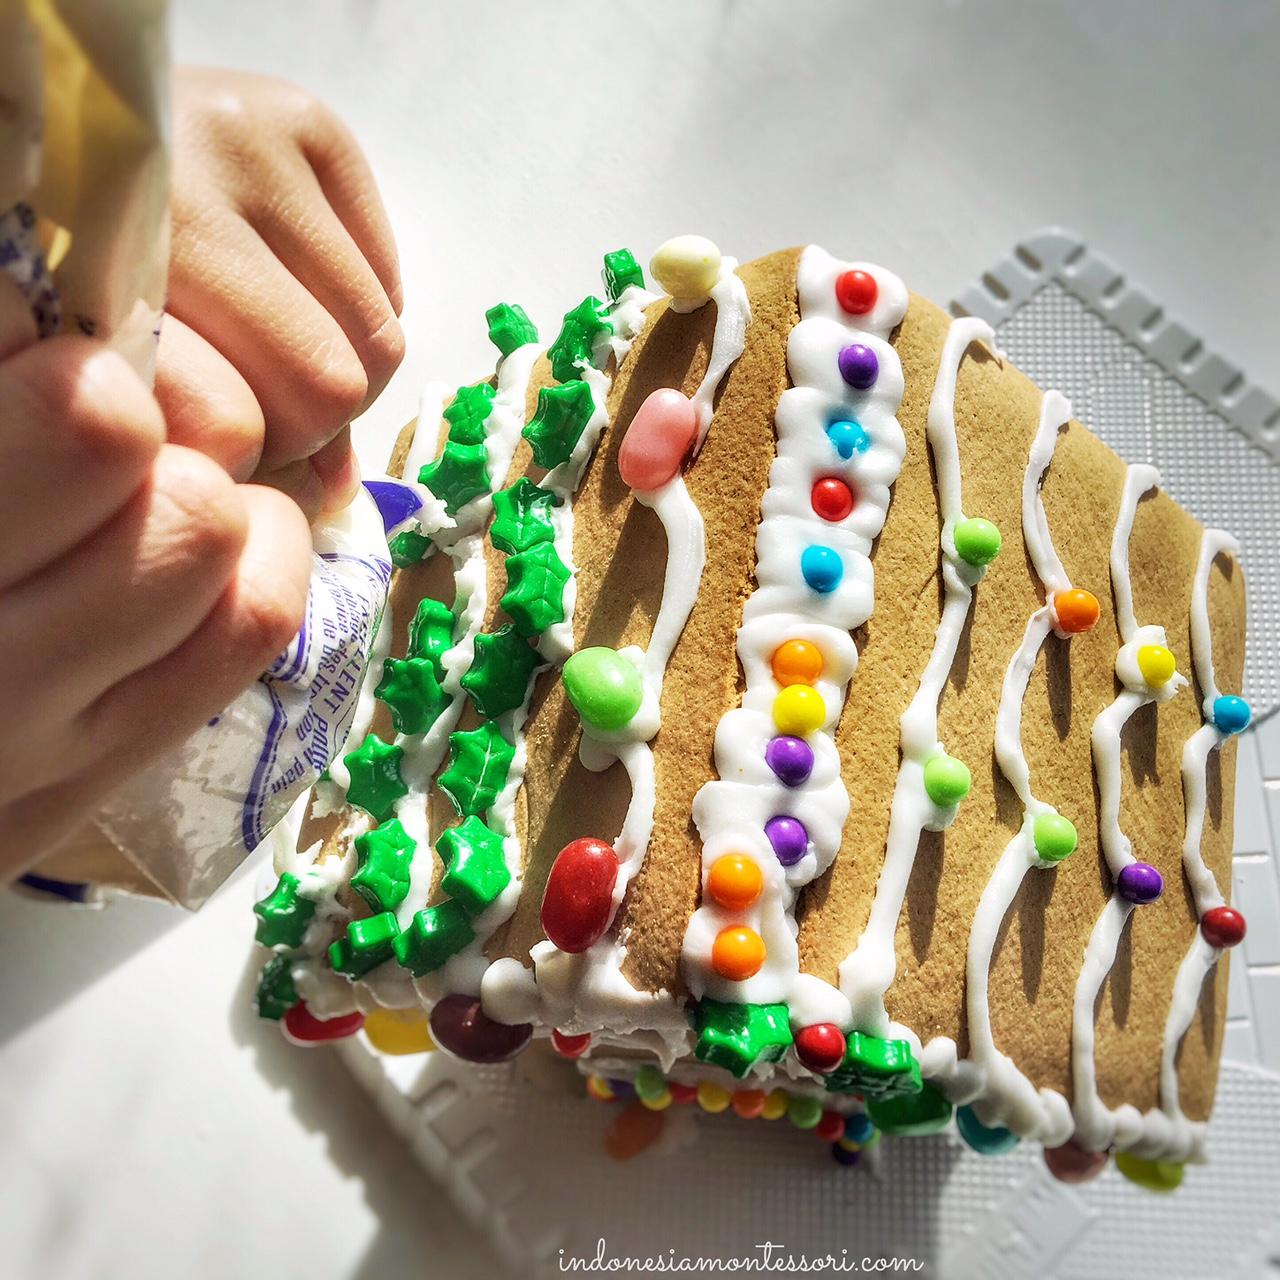 gingerbread house kit natal kegiatan